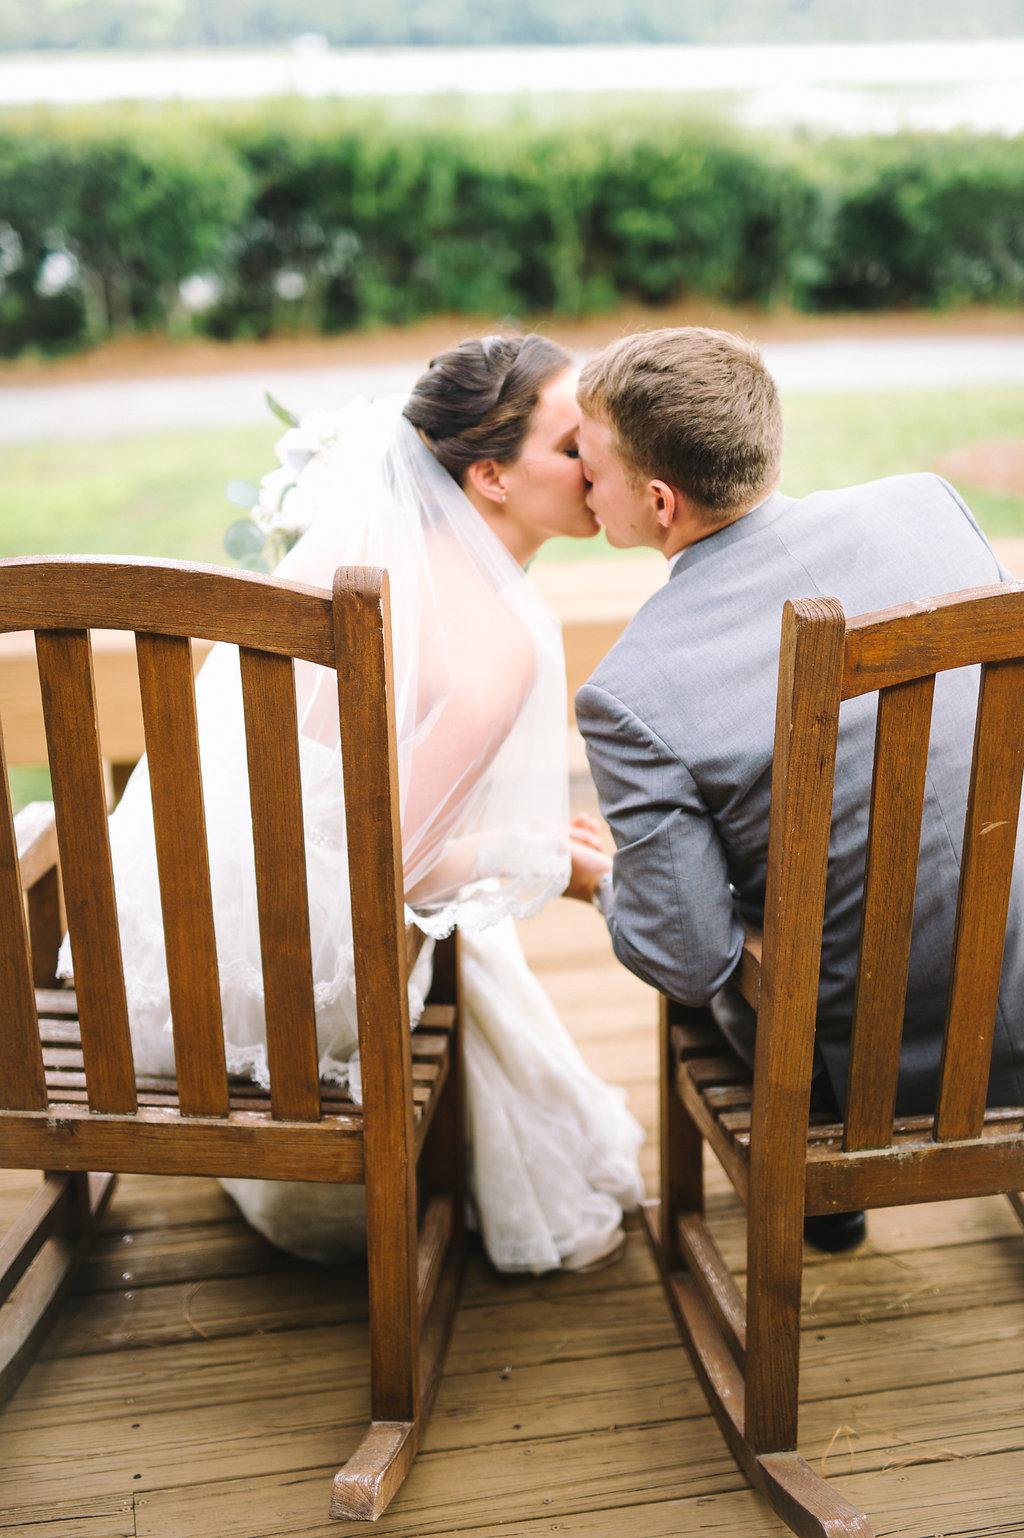 meagan-and-brenden-rach-loves-troy-photography-ivory-and-beau-bridal-boutqiue-ti-adora-wedding-dress-gold-lace-wedding-dress-savannah-wedding-planner-savannah-weddings-oldfield-plantation-wedding-savannah-florist-20.jpg